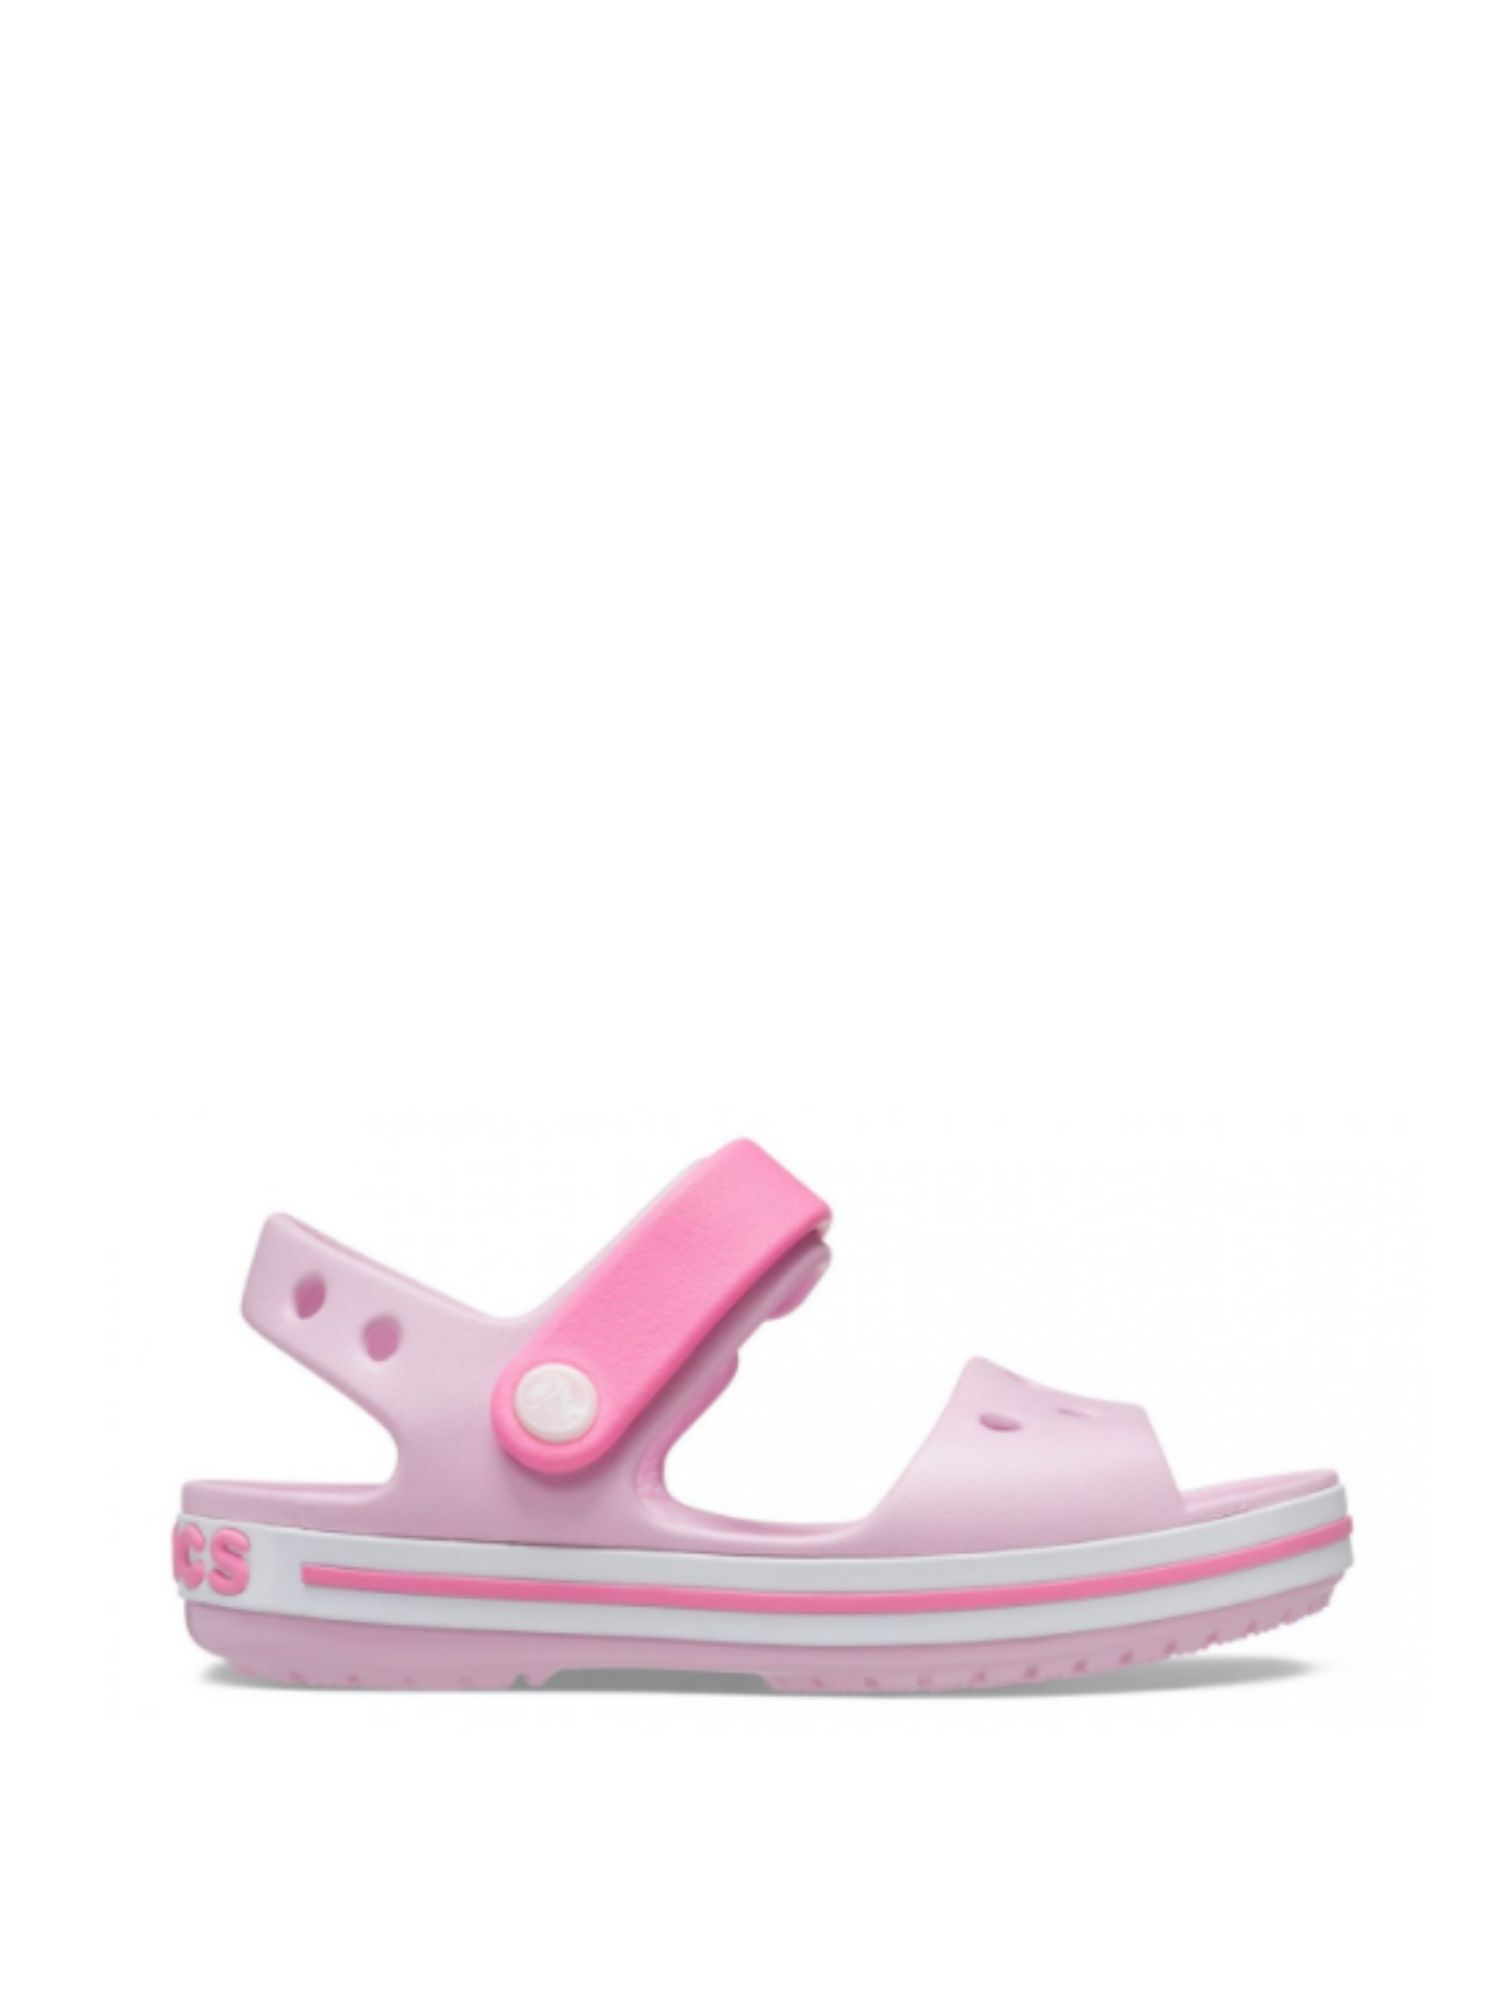 Sandalo Crocs bambino Crocband Sandalo K 12856 Pink